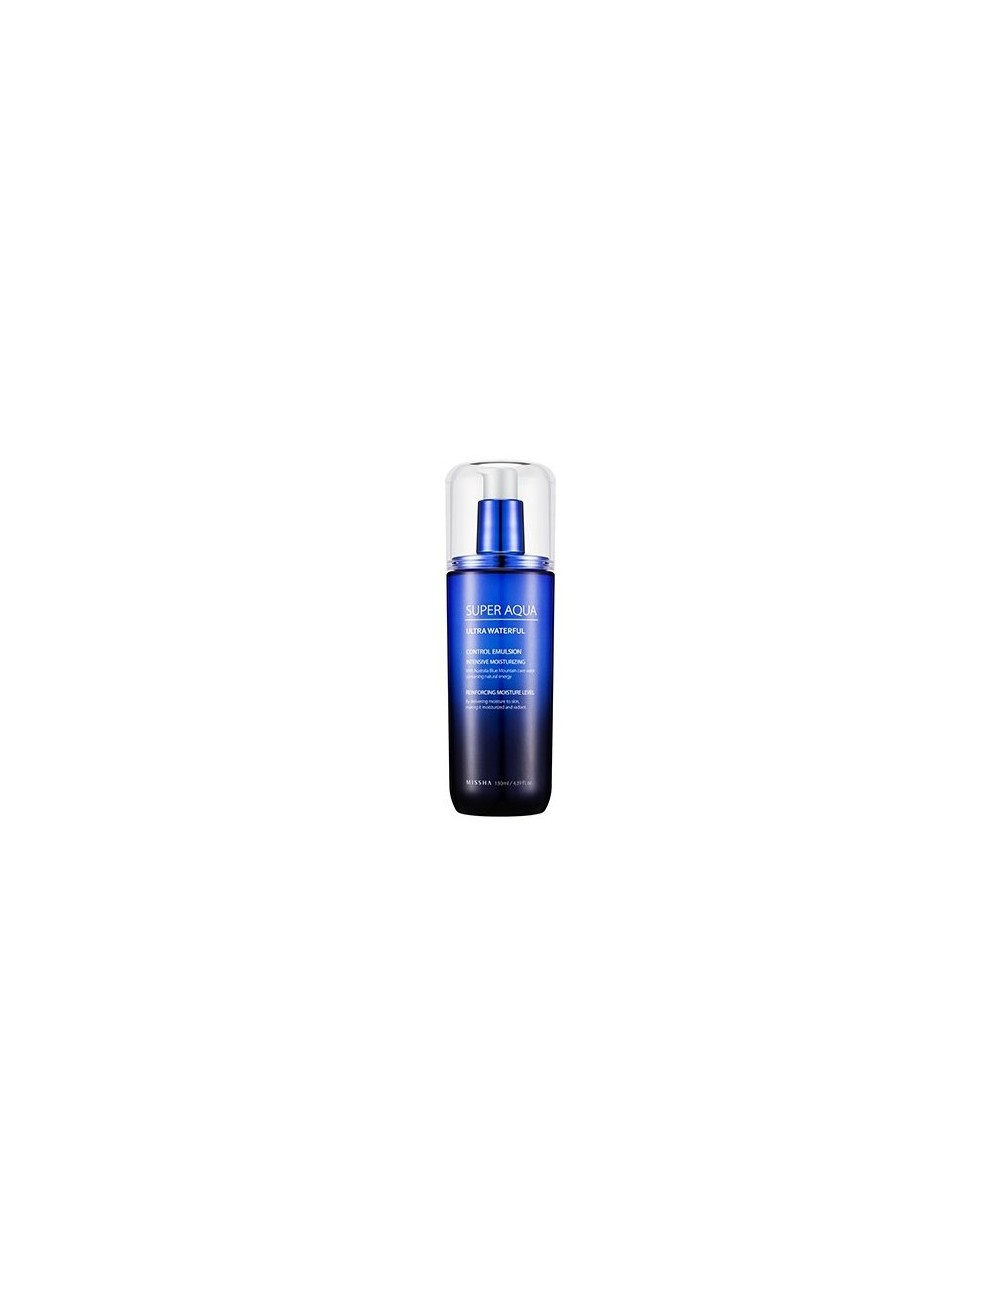 Crema Hidratante Fluida (Anti-edad y Anti-manchas) MISSHA Super Aqua Ultra Waterful Control Emulsion